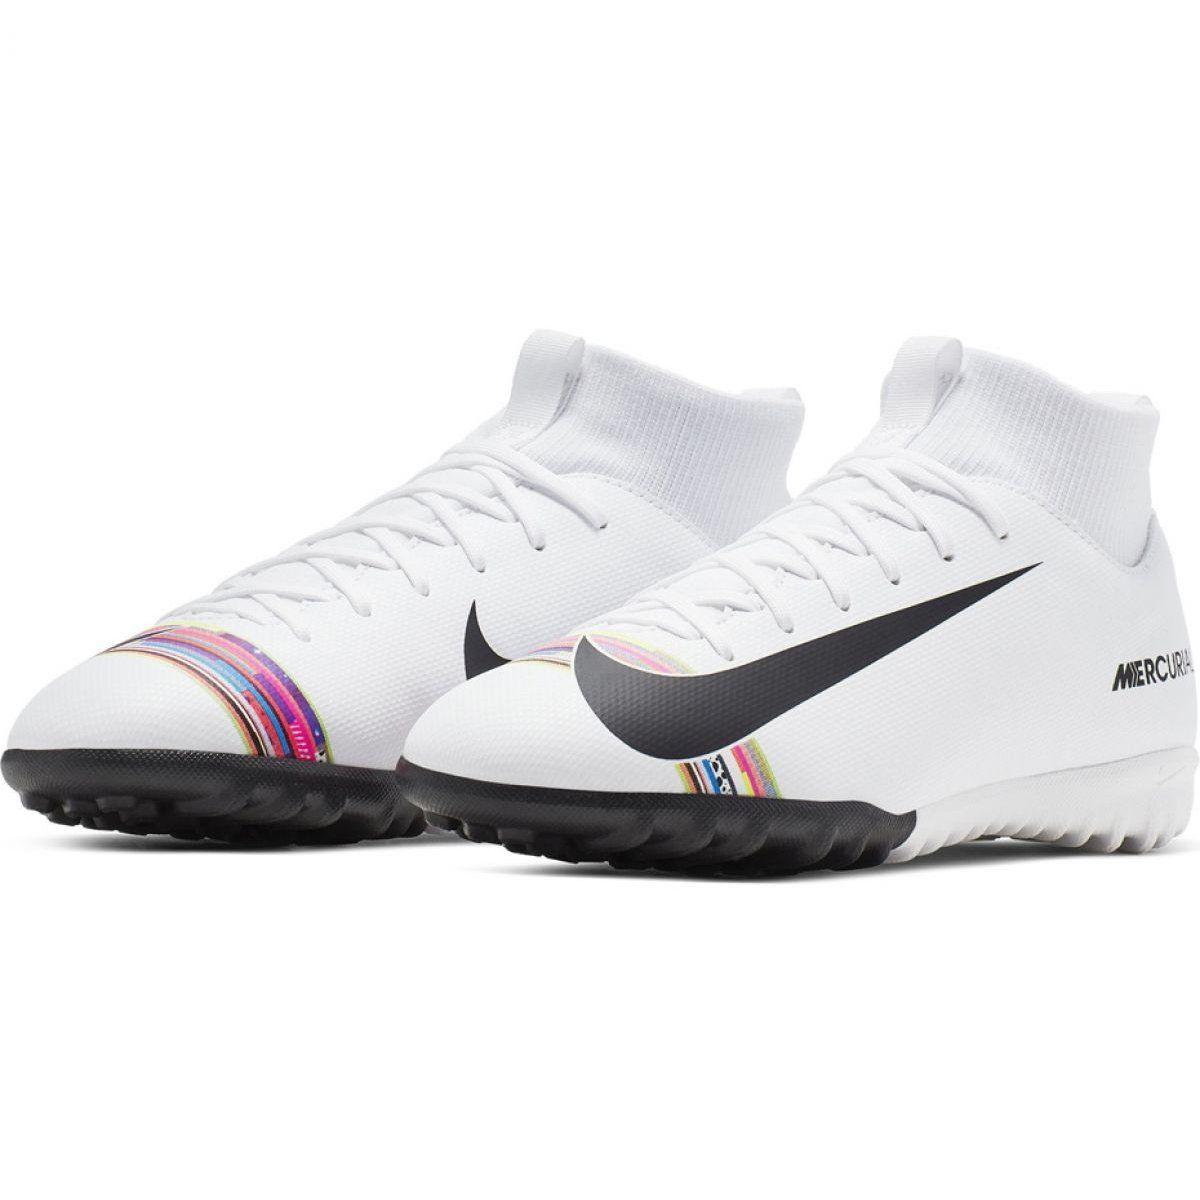 Nike Mercurial Superfly X 6 Academy Tf Jr Aj3112 109 Football Boots White Multicolored Astro Turf Trainers Football Boots Astro Football Boots